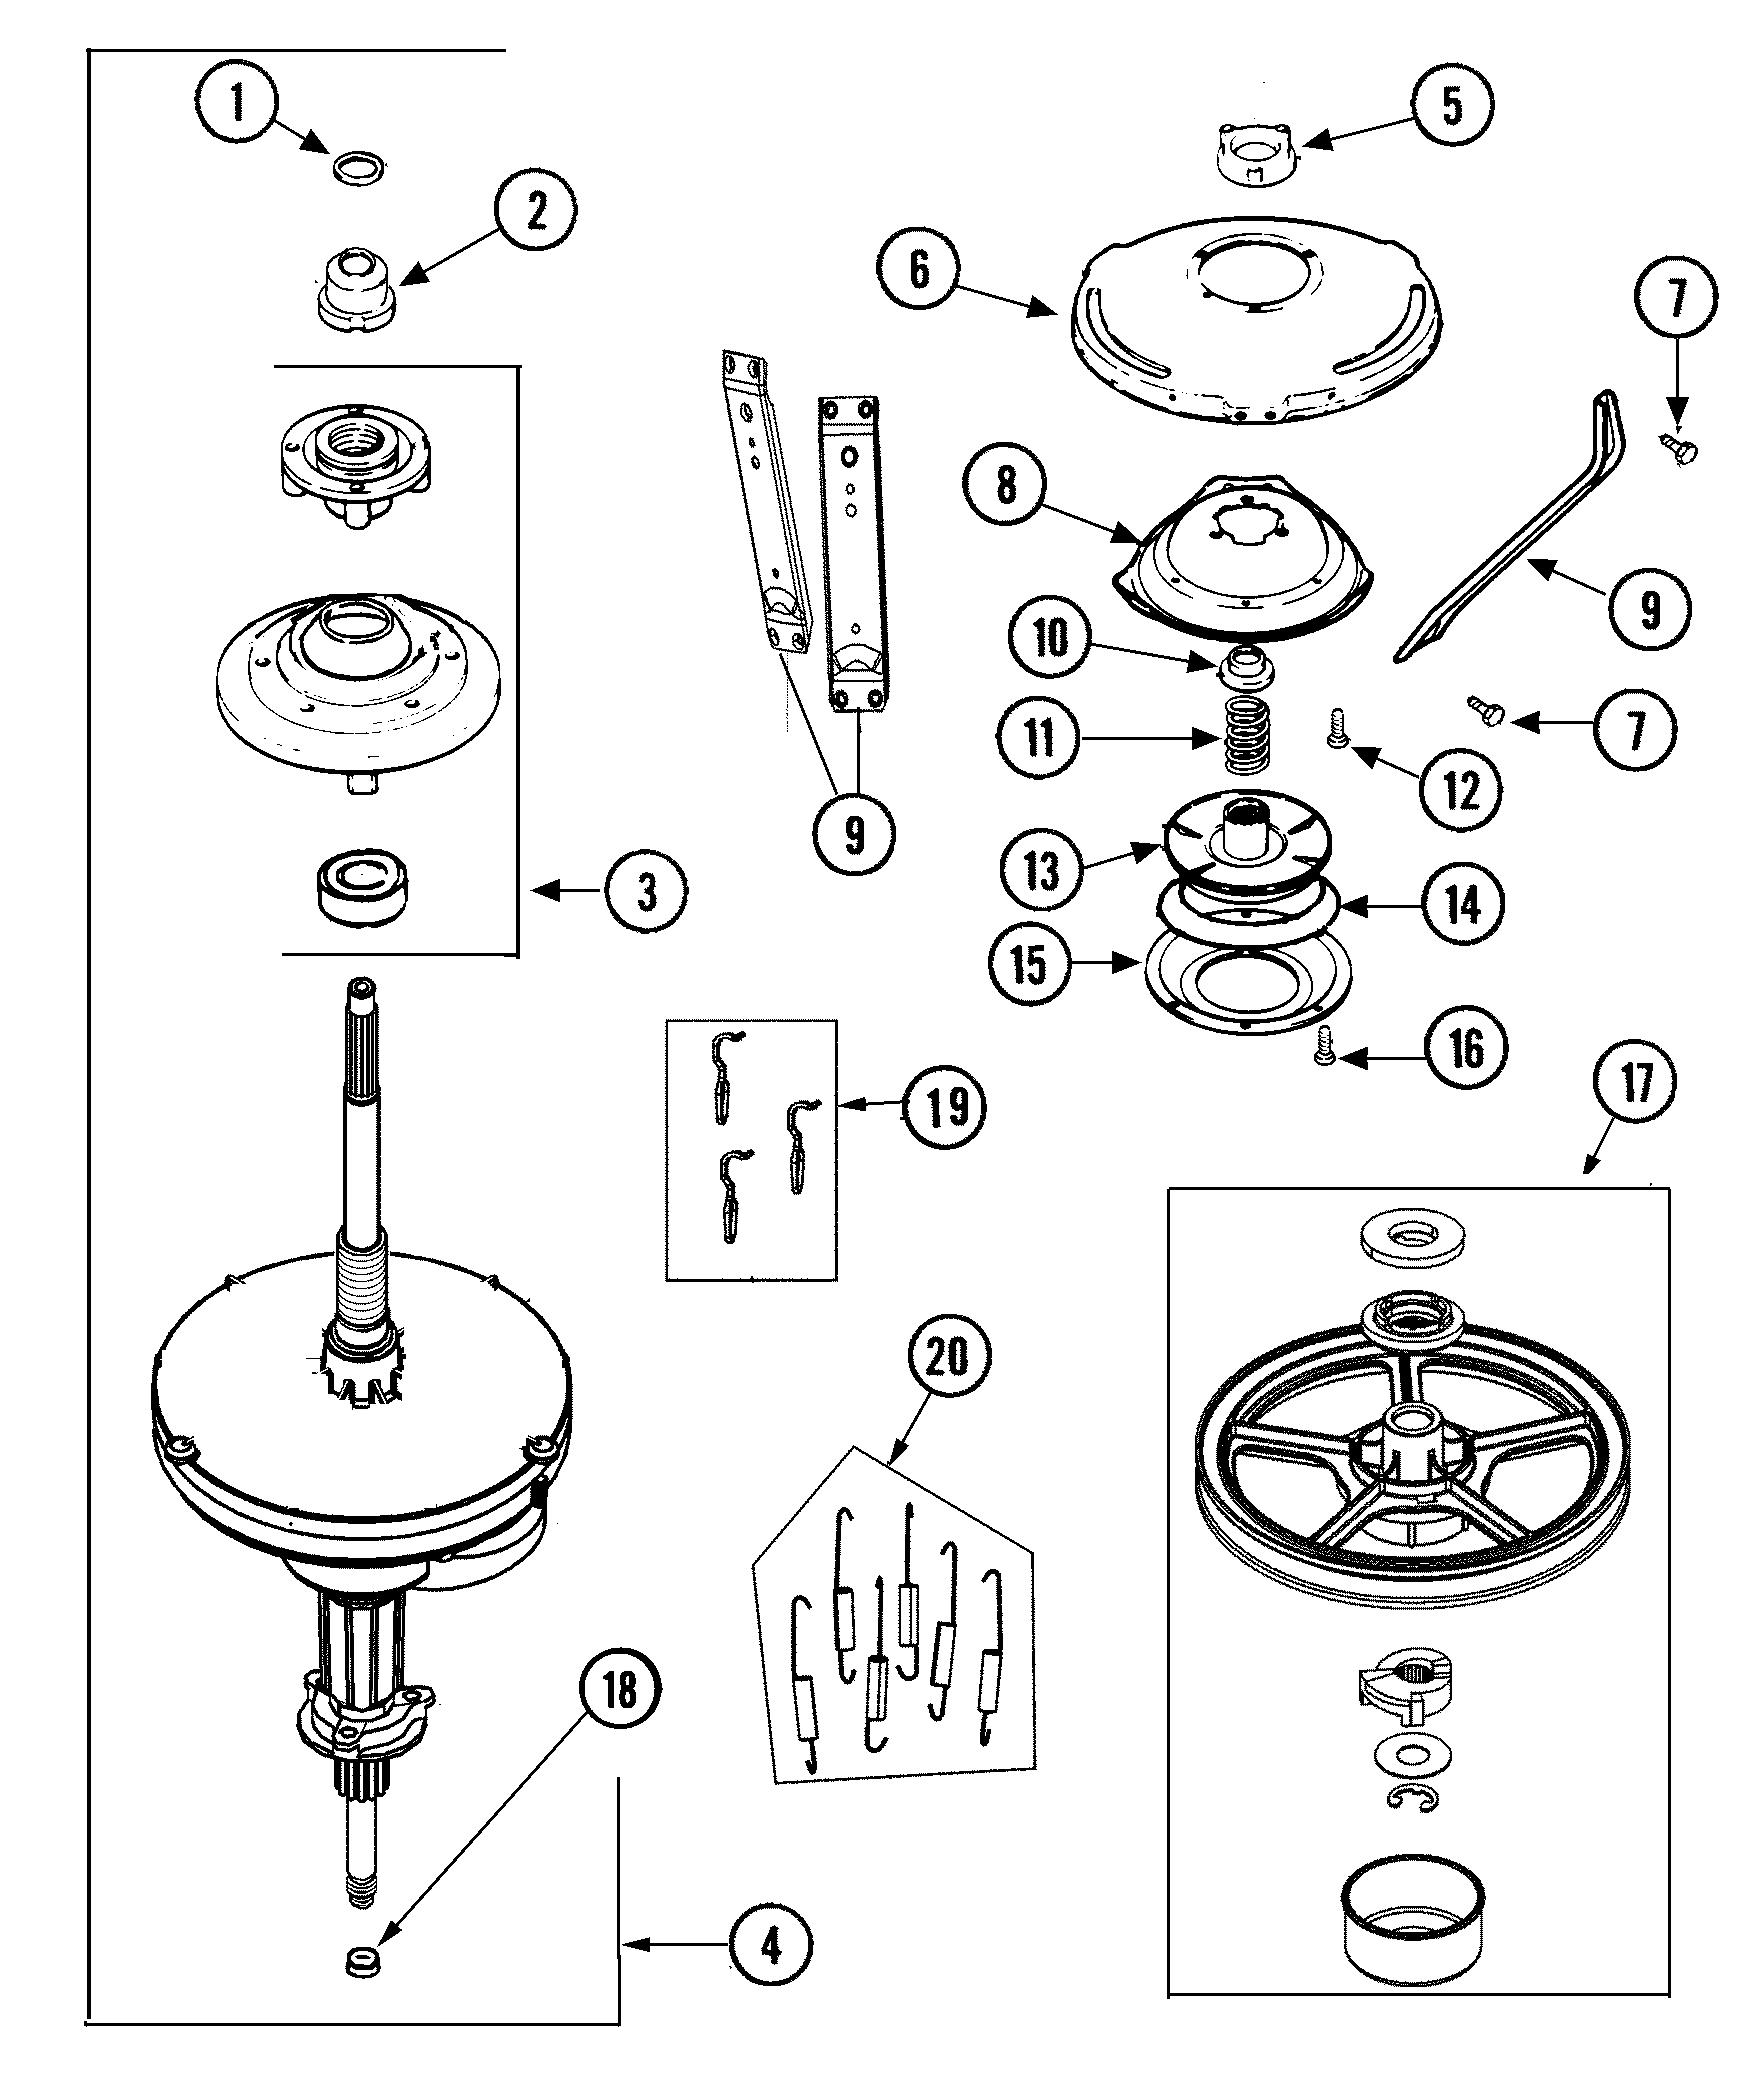 hight resolution of maytag mav4757aww transmission diagram